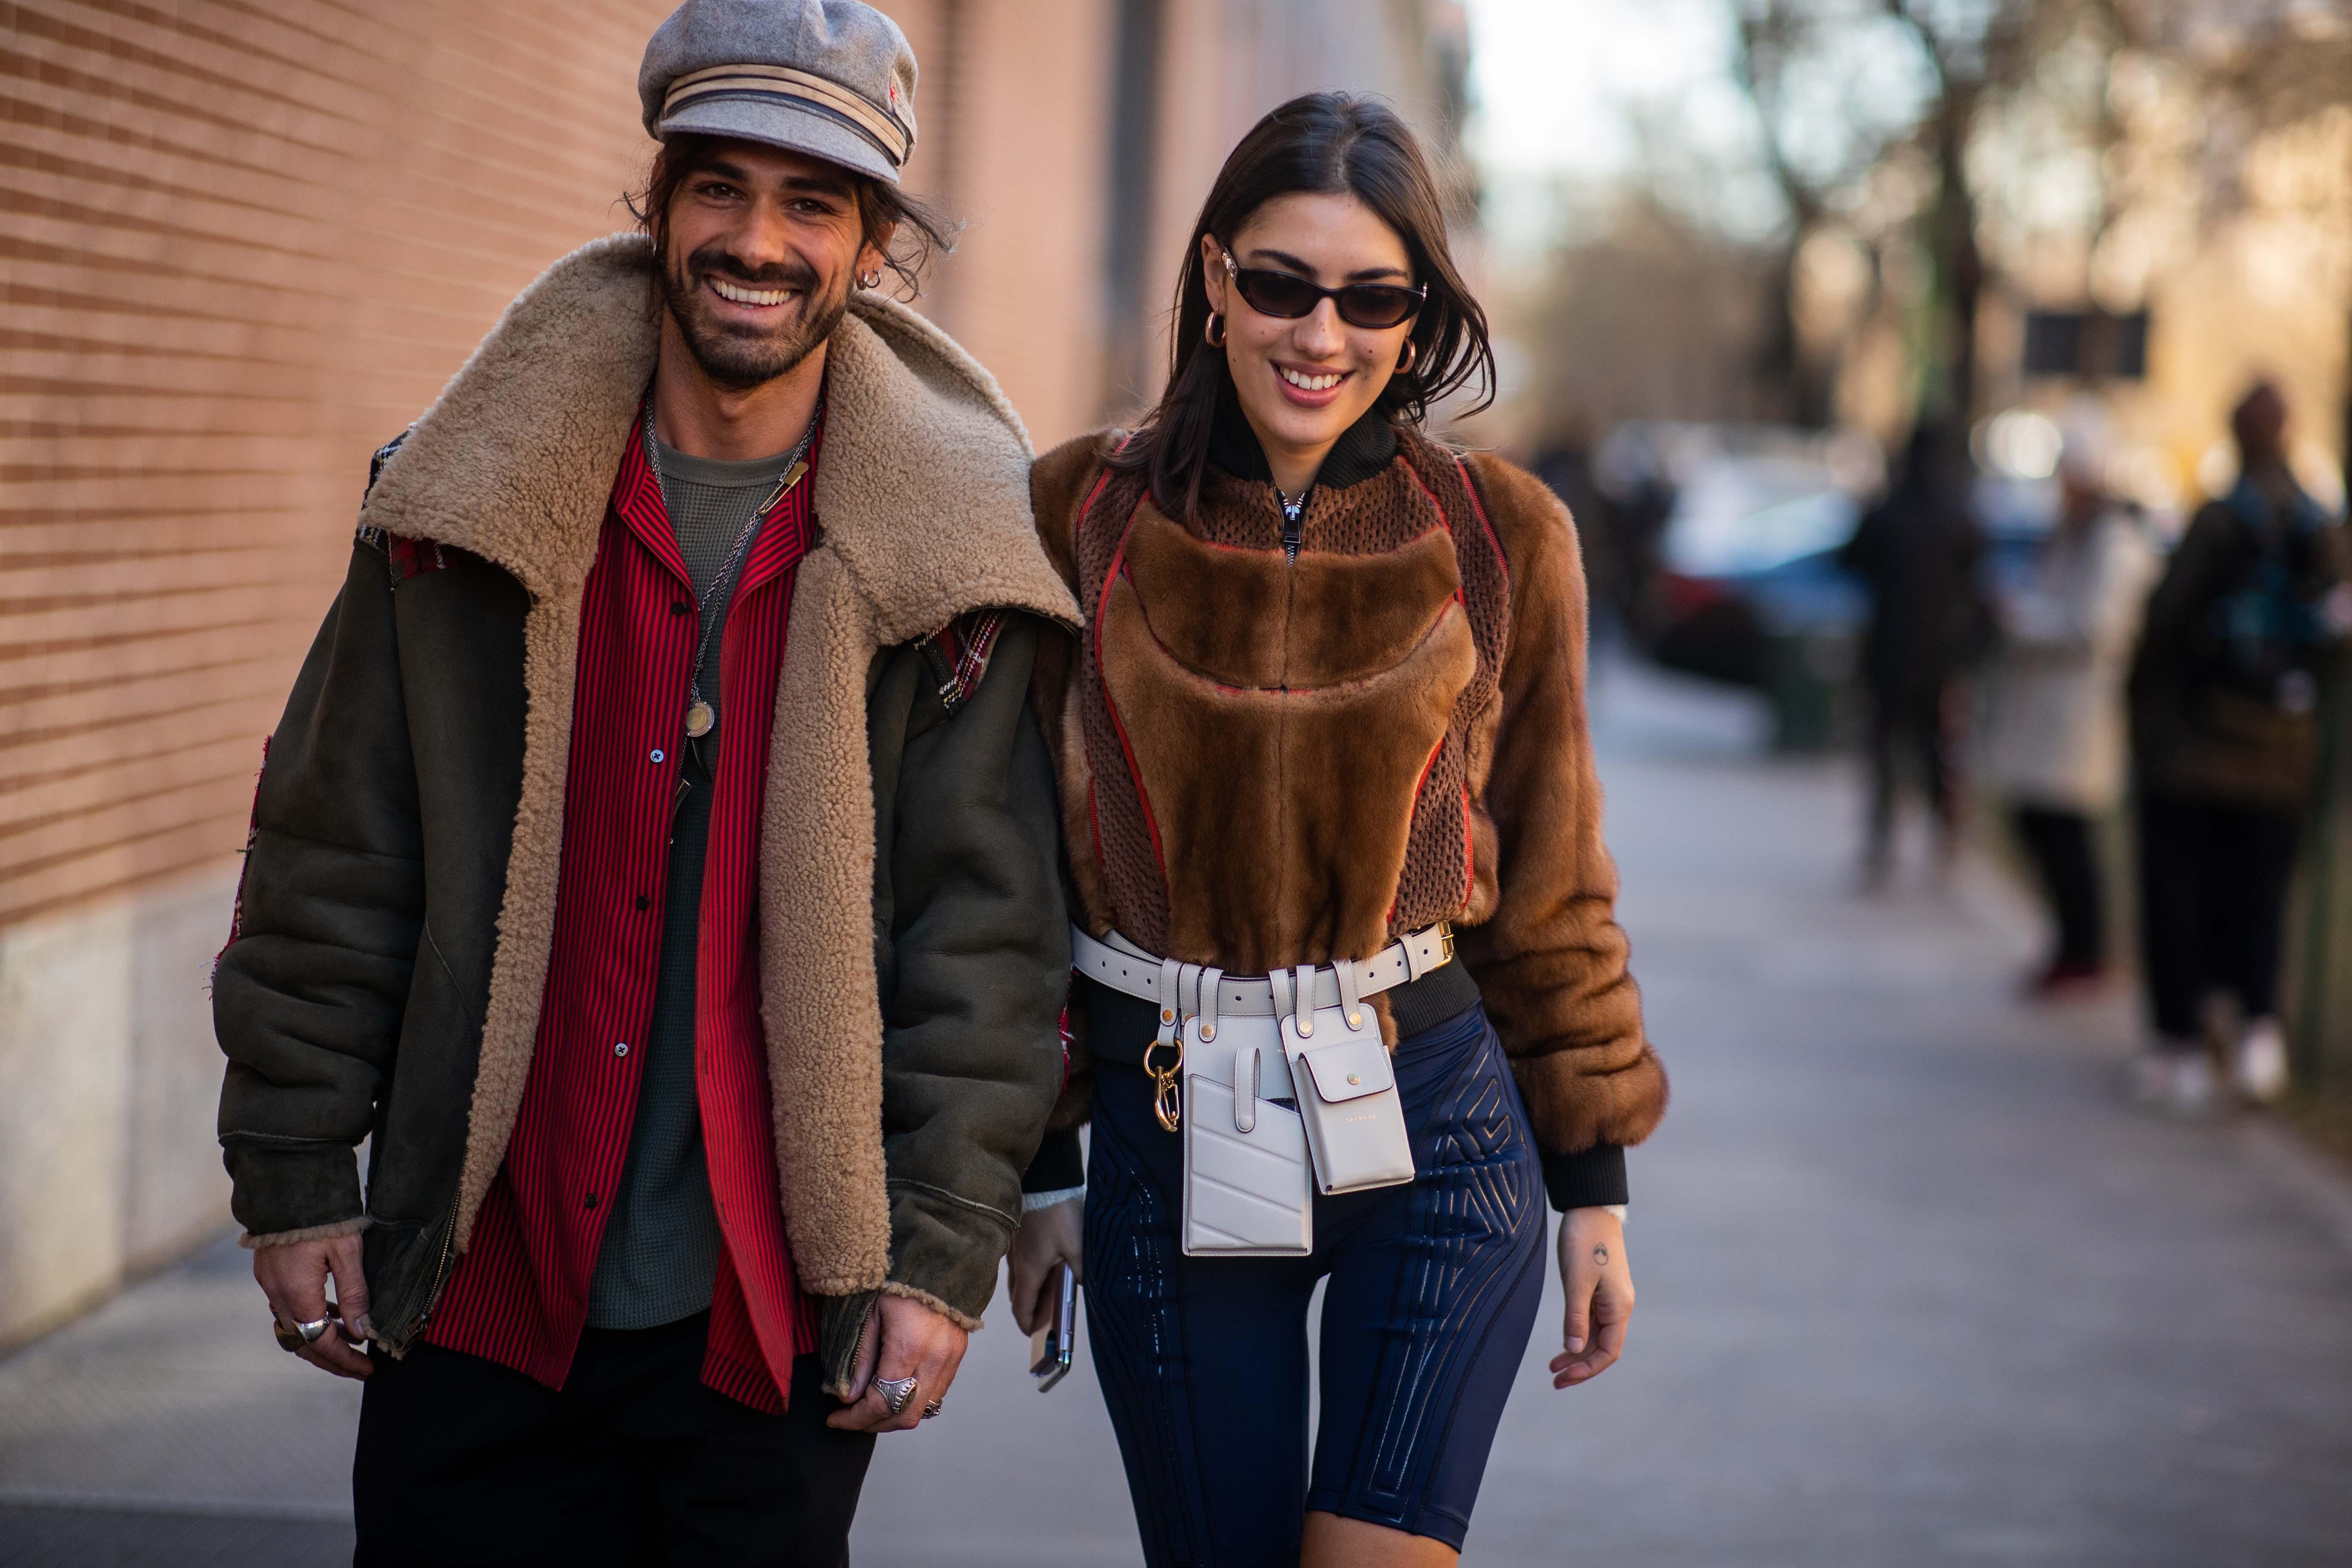 Italian Fashion And Clothing: How to Dress Like An Italian